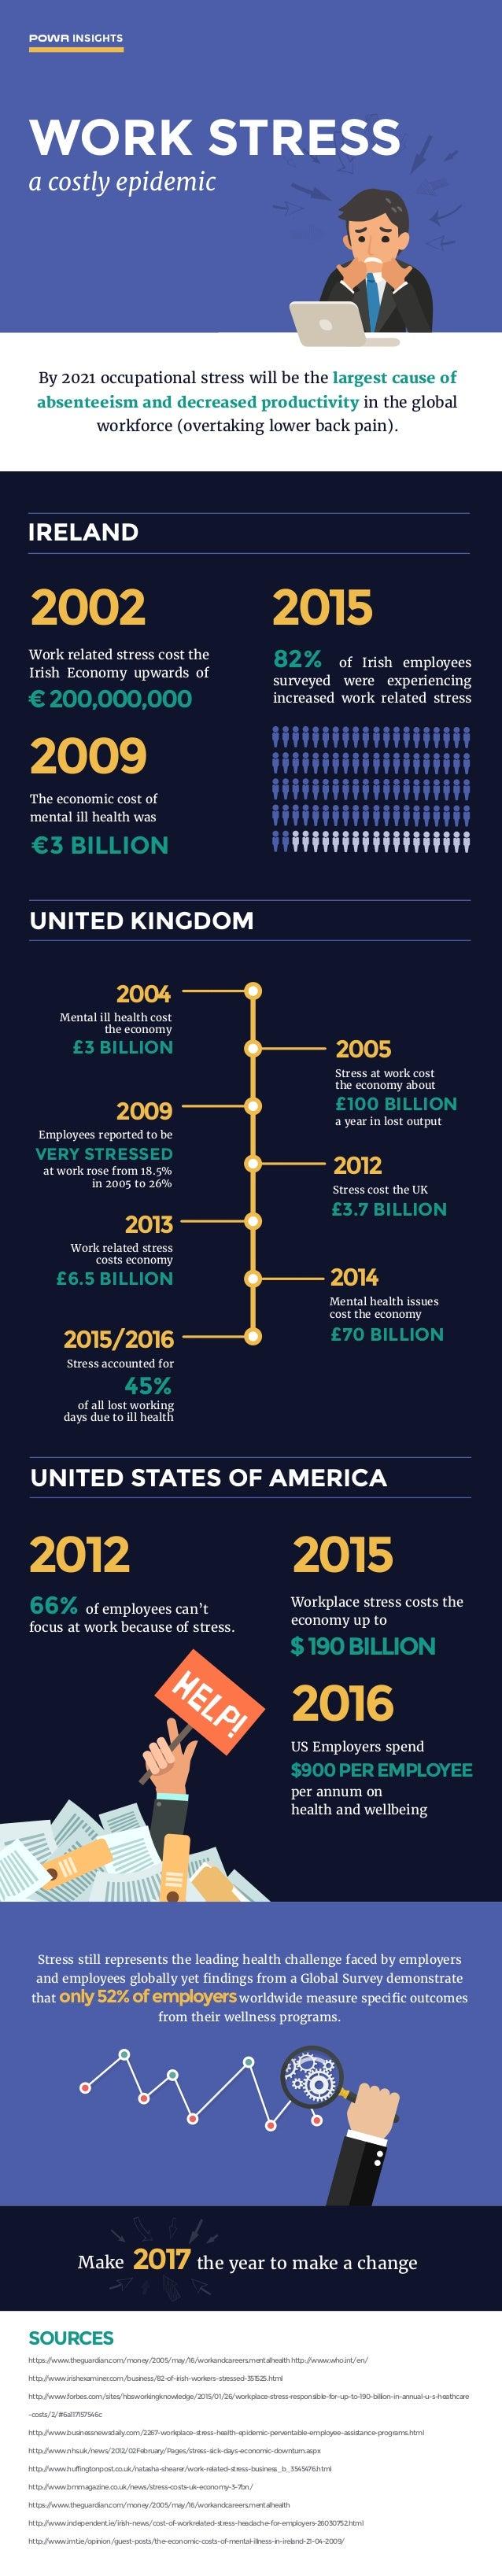 POWR INSIGHTS a costly epidemic IRELAND 2002 2009 2015 Work related stress cost the Irish Economy upwards of The economic ...